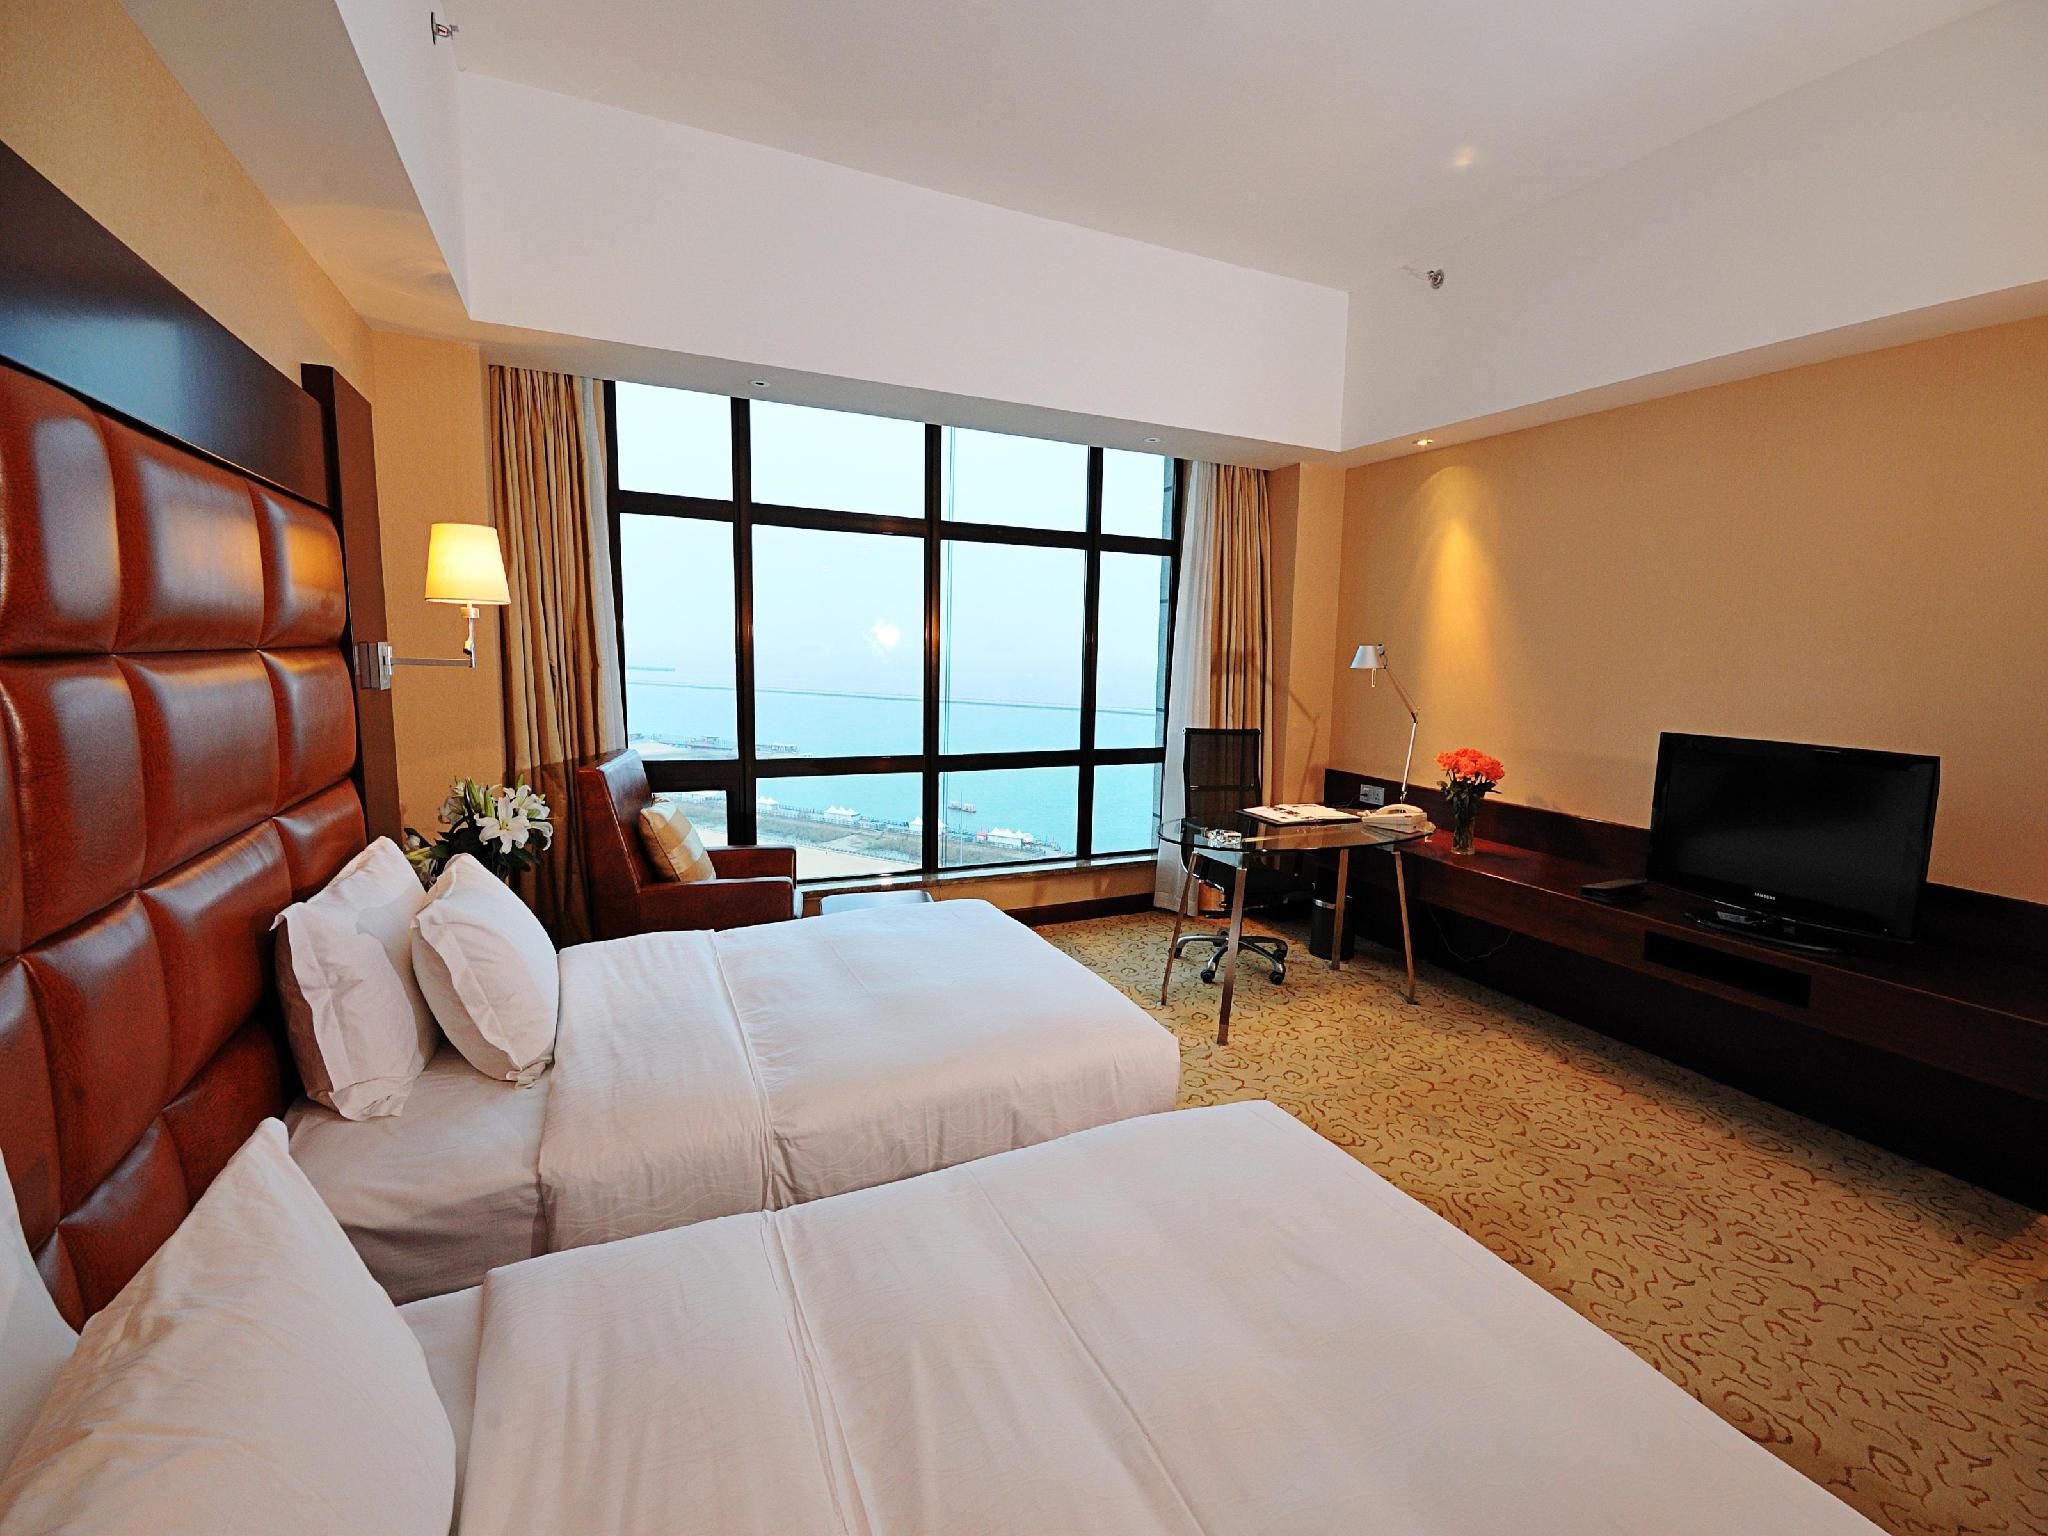 Shanghai Luminous Modern Universe Apartment Hotel